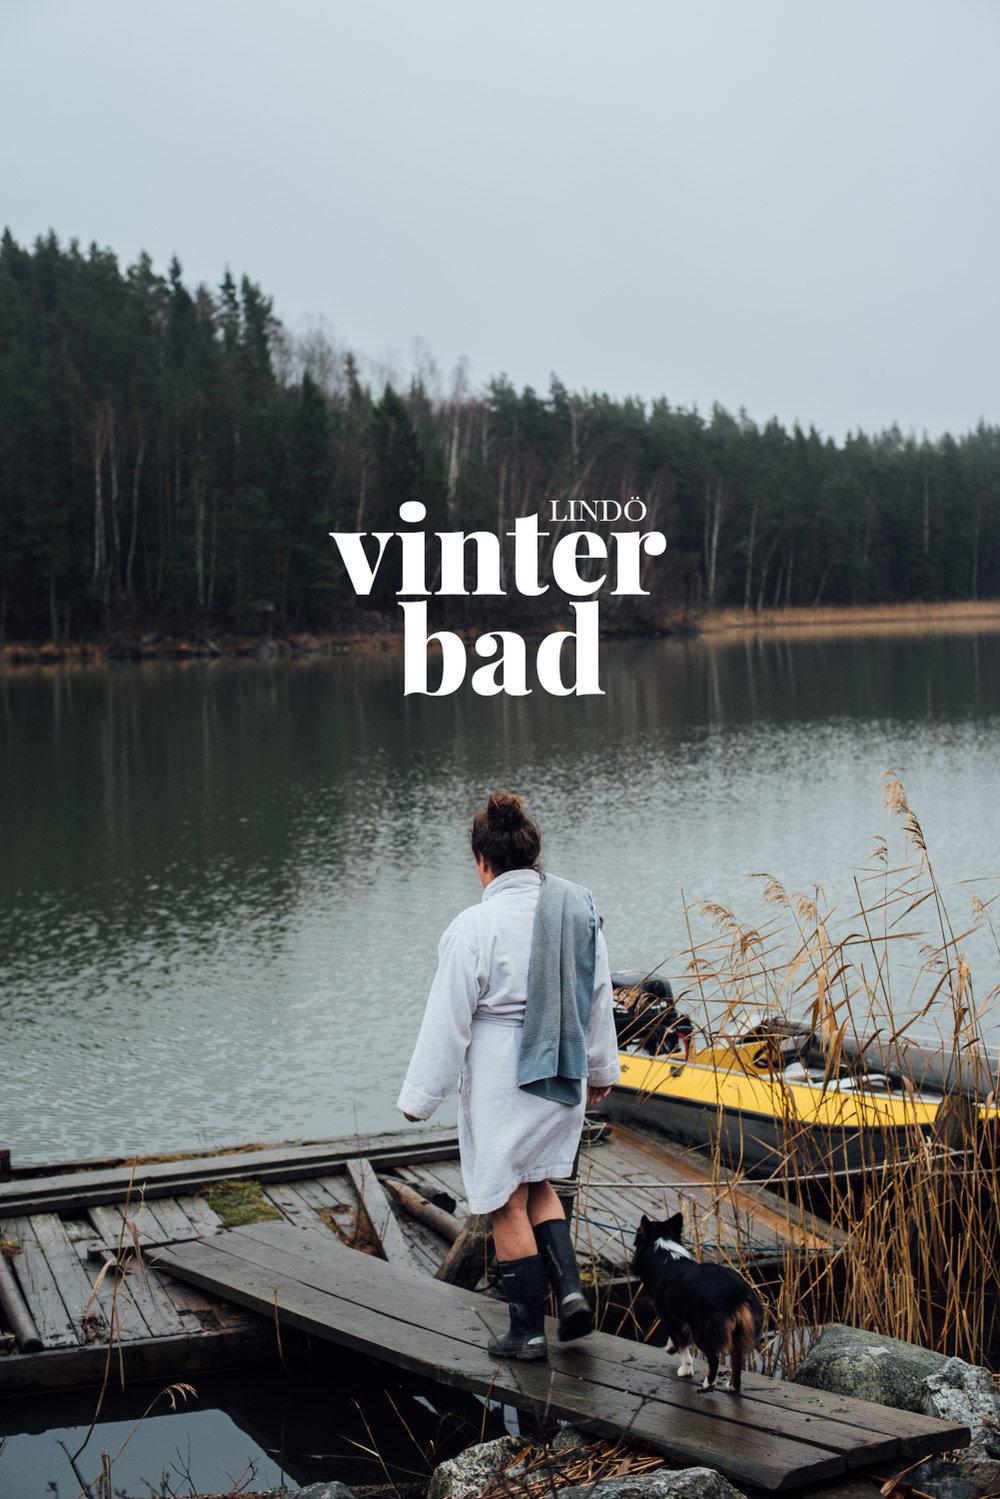 vinterbada i sverige under vintern